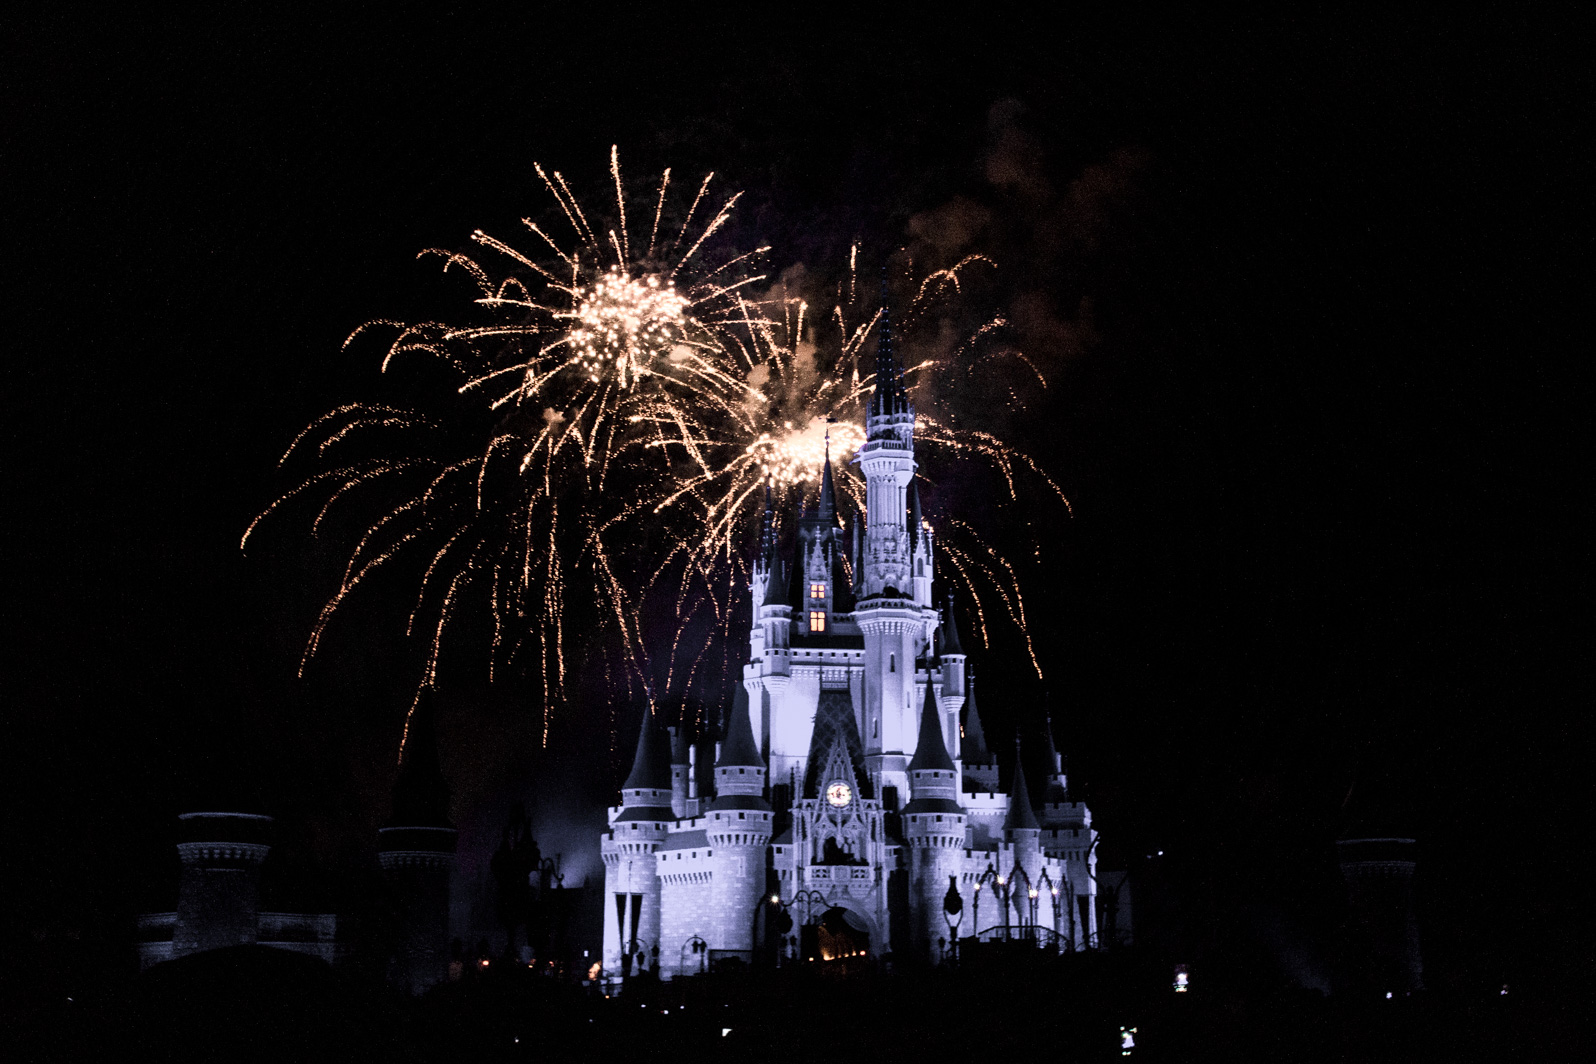 Magic Kingdom fireworks above the castle